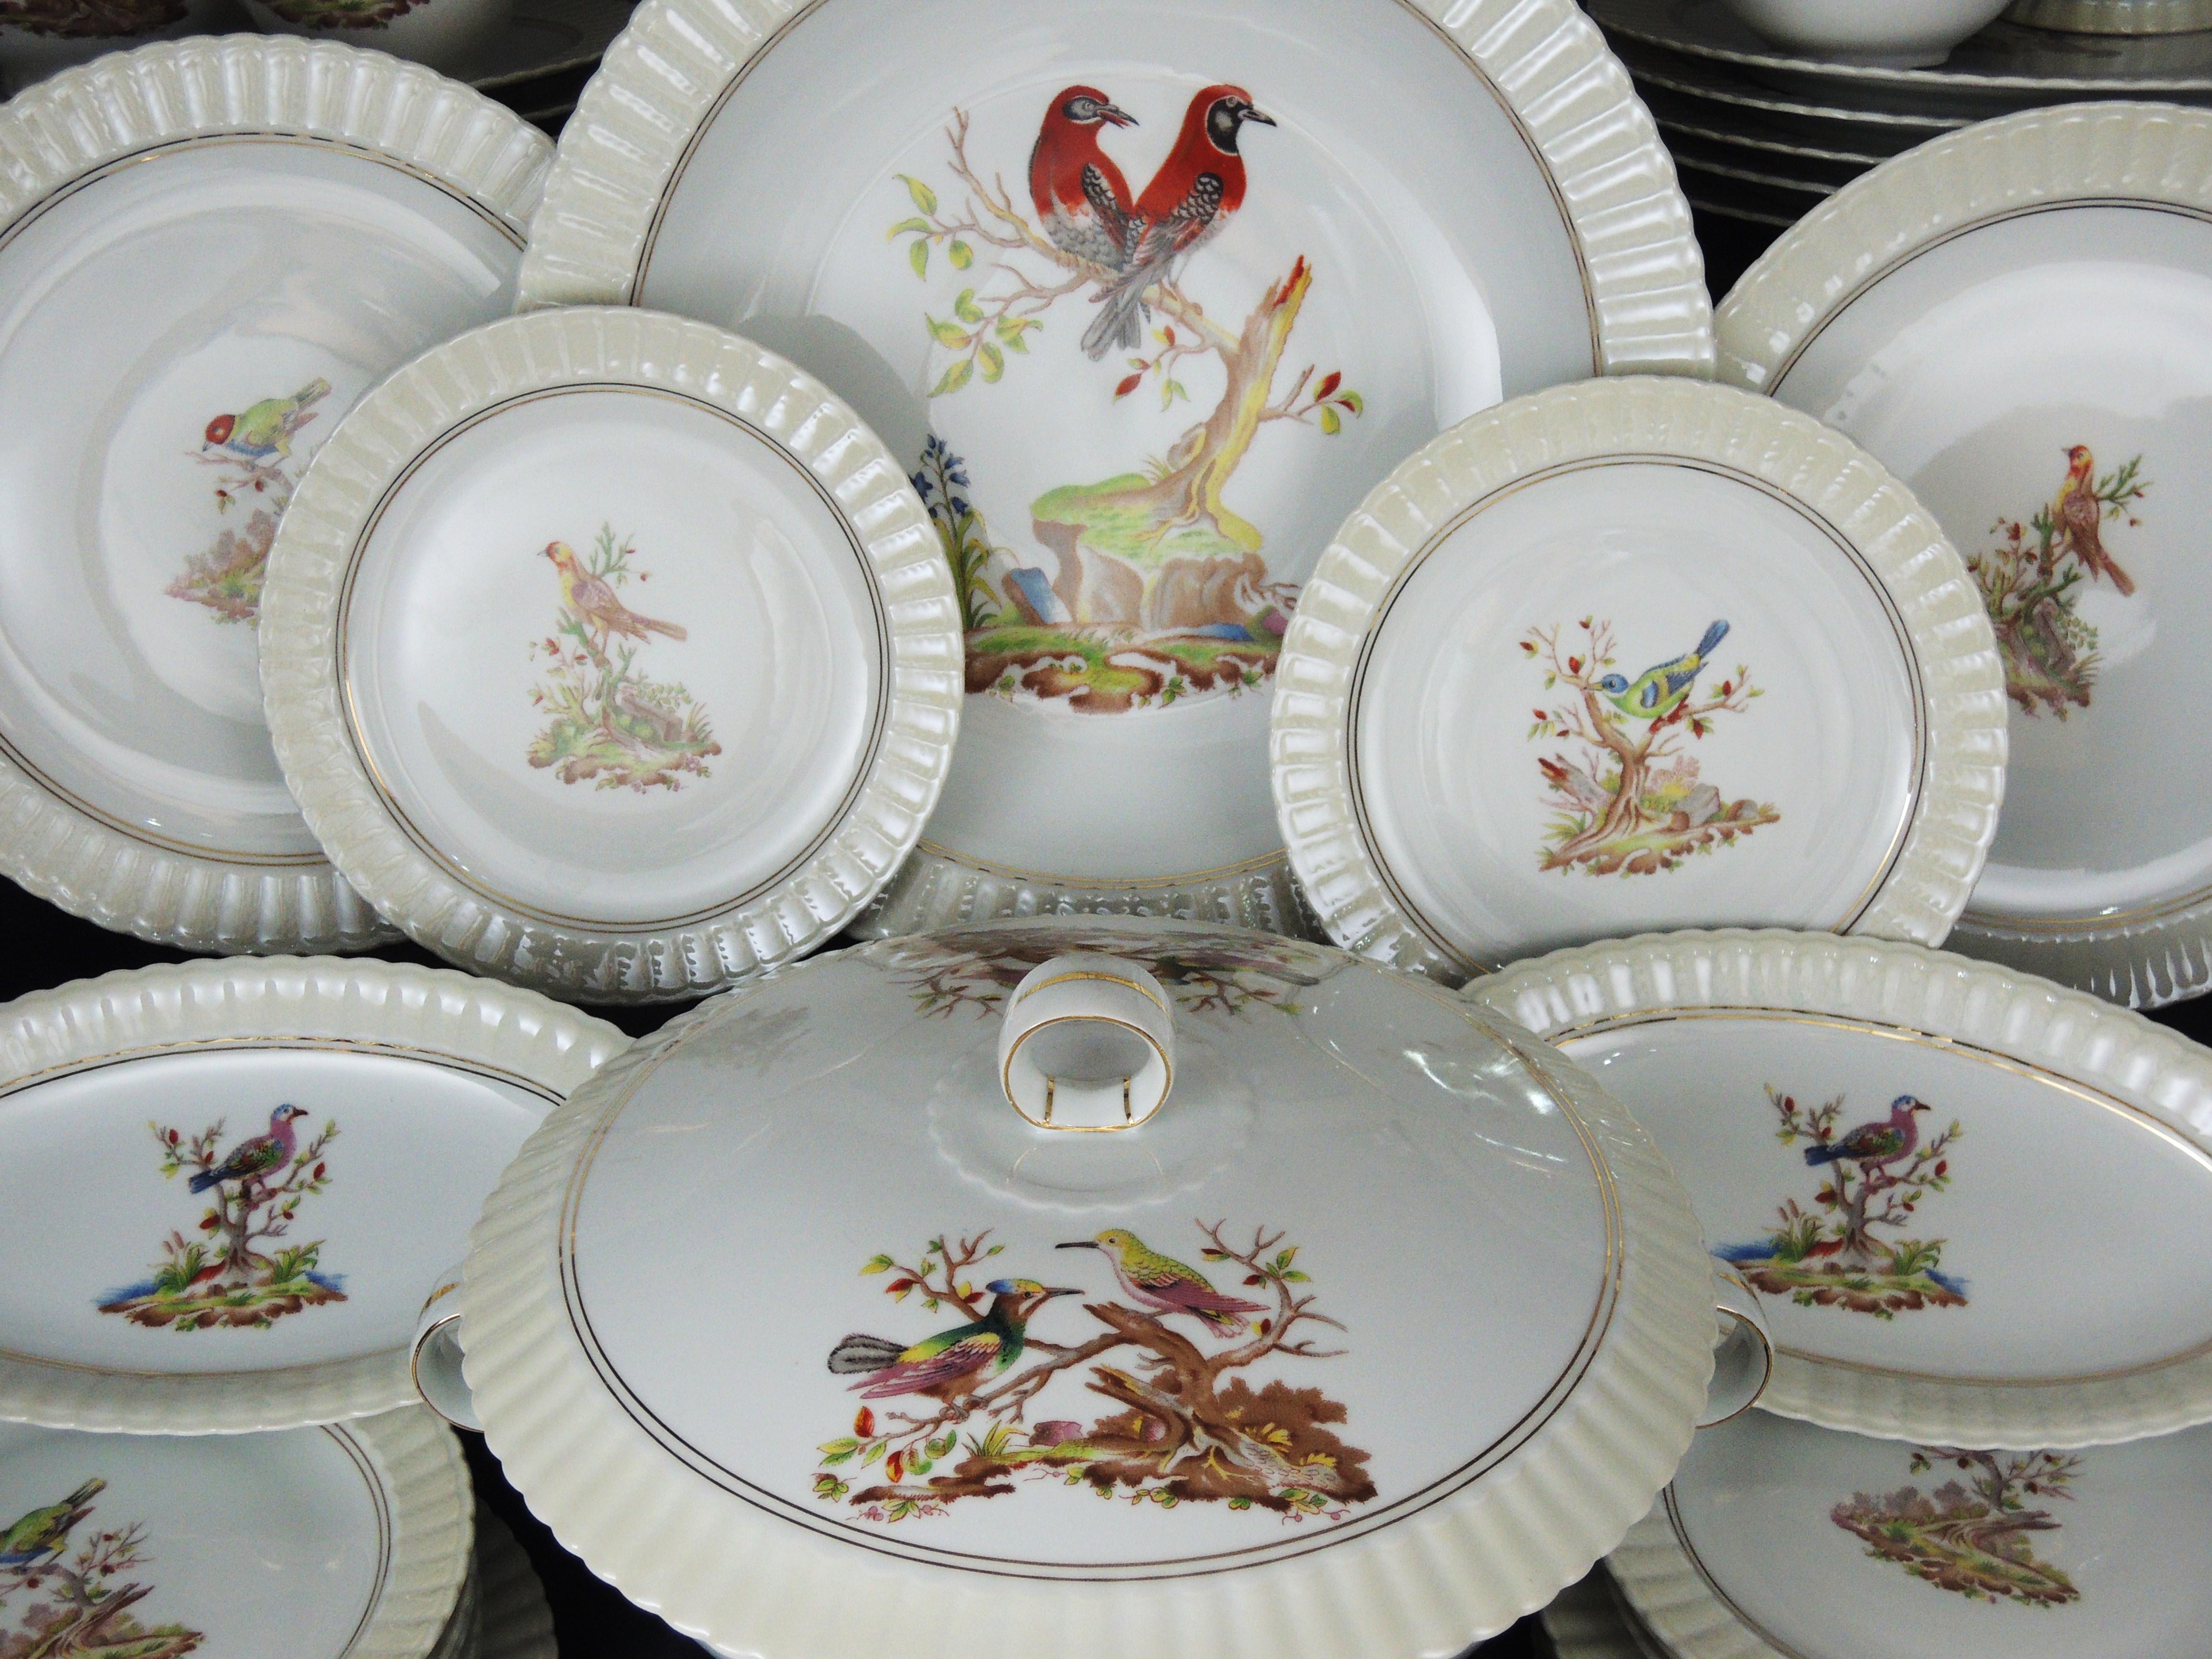 bernardaud limoges porcelaine service de table dinnerware. Black Bedroom Furniture Sets. Home Design Ideas